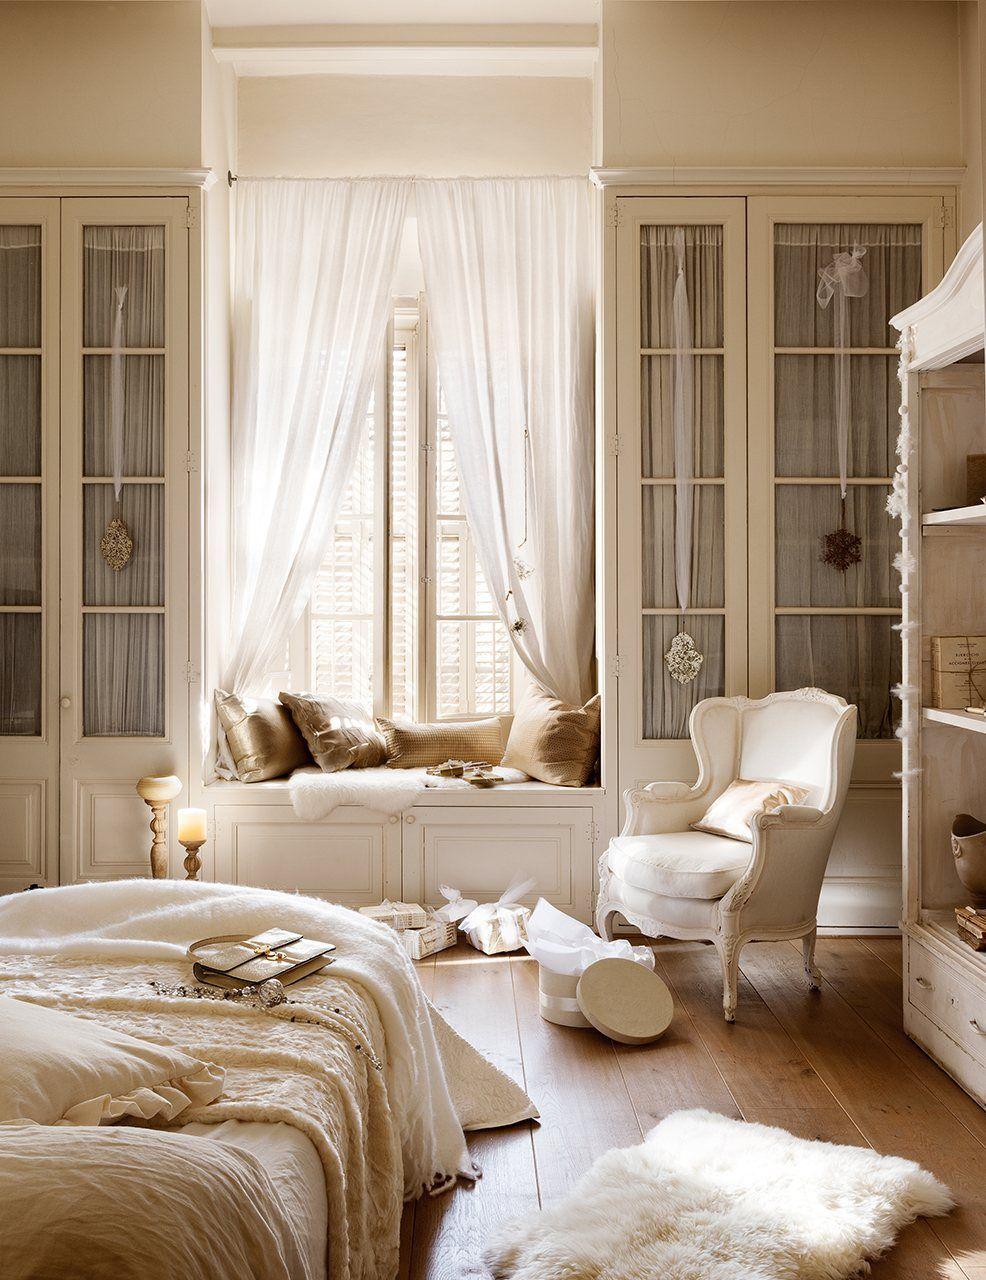 Window seat with bed  navidad navidad blanca navidad  bedrooms window and neutral